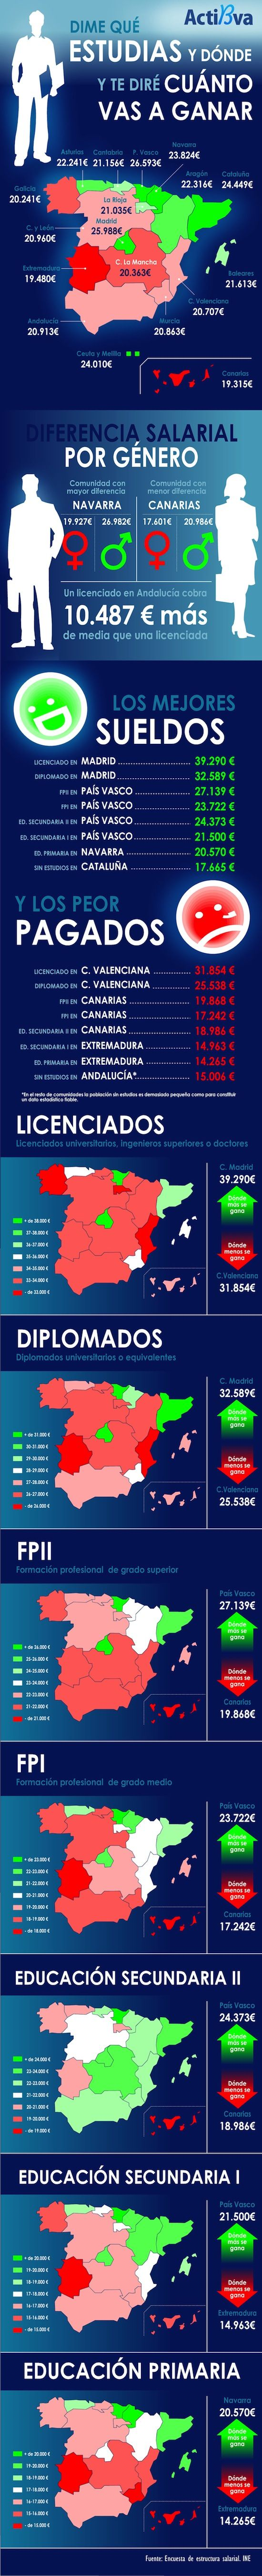 Muchas infografias en espanol